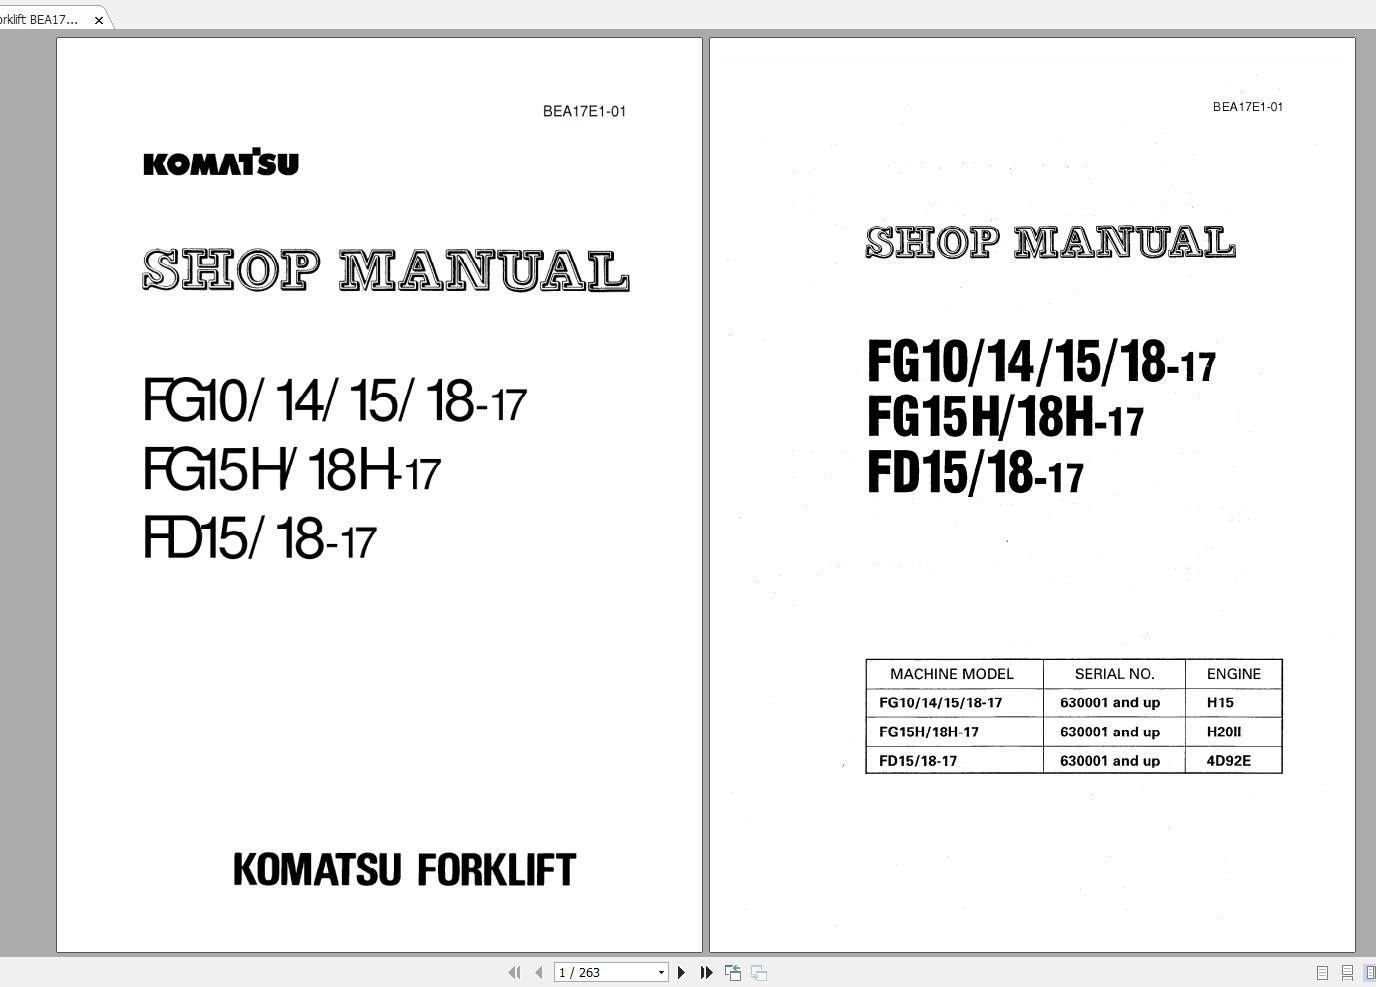 Komatsu_Forklift_Service_Manual_PDF_DVD5